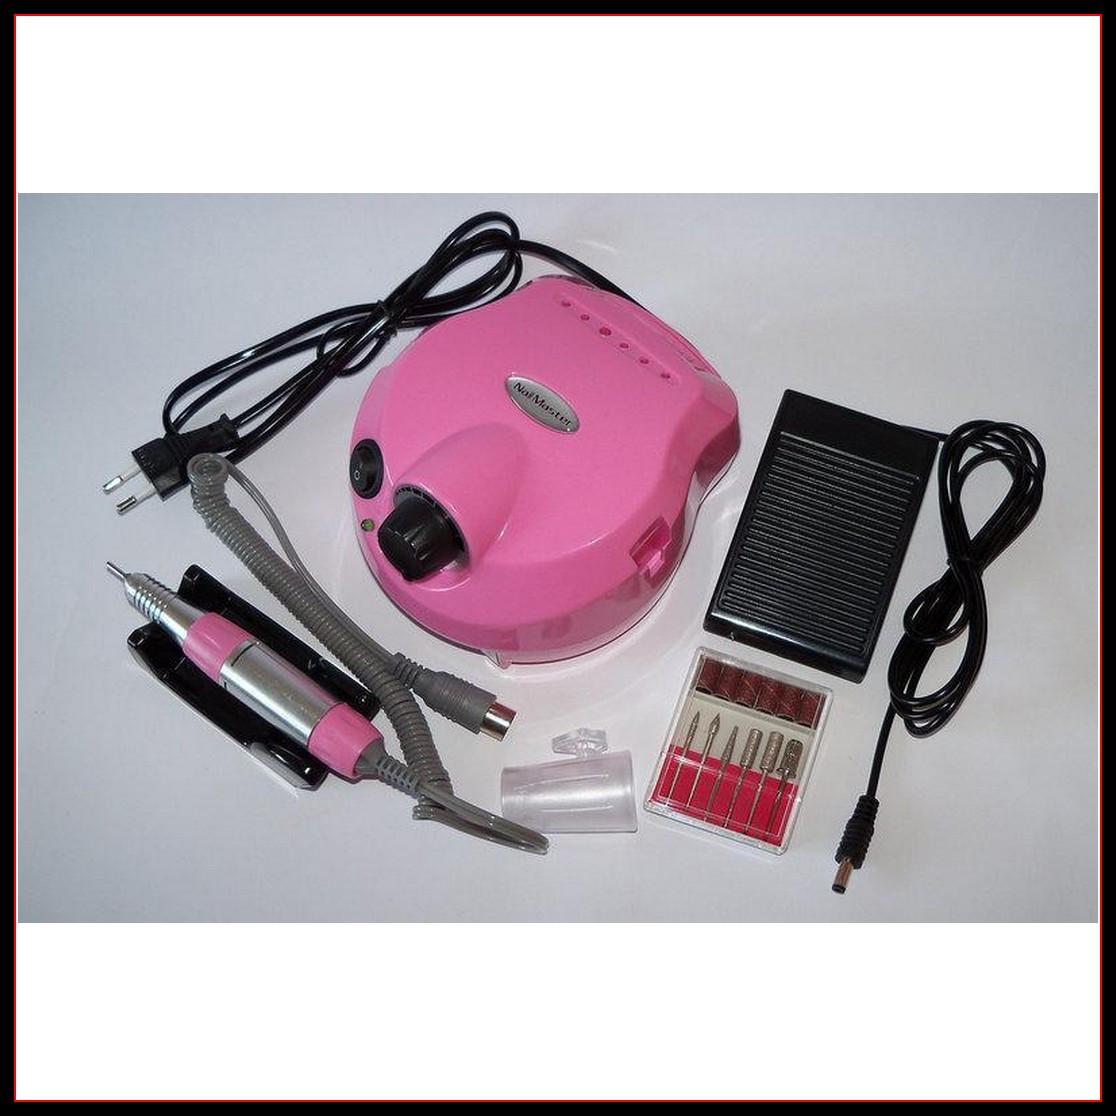 Машинка для маникюра Beauty nail DM-202